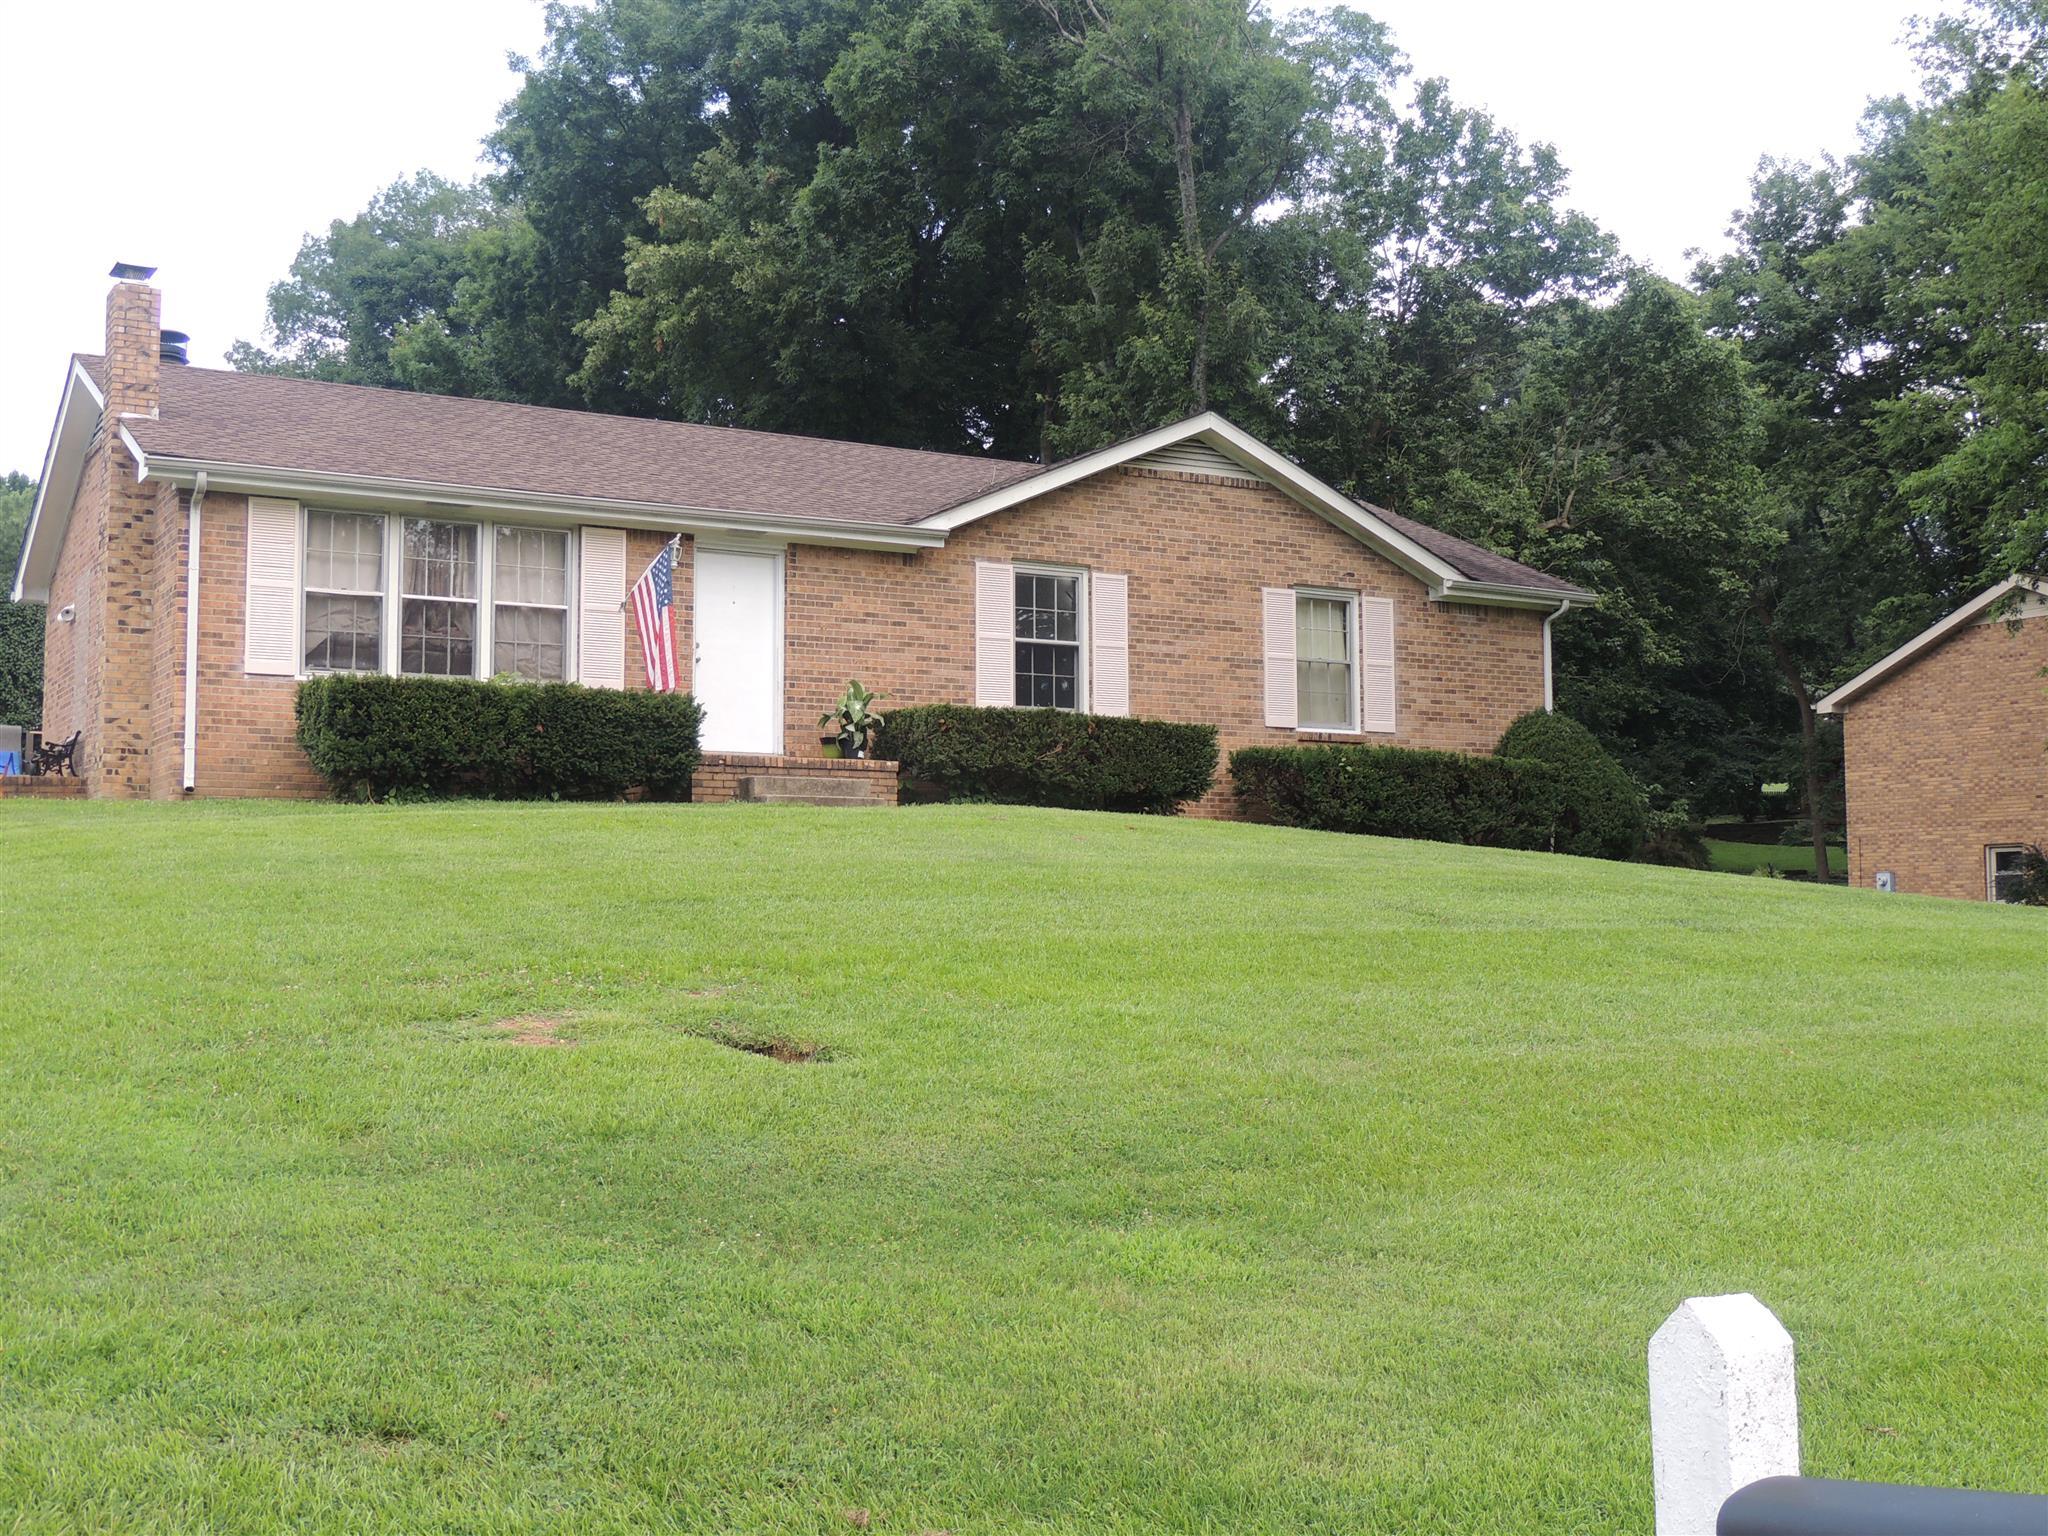 1805 Auburn Dr, Clarksville, TN 37043